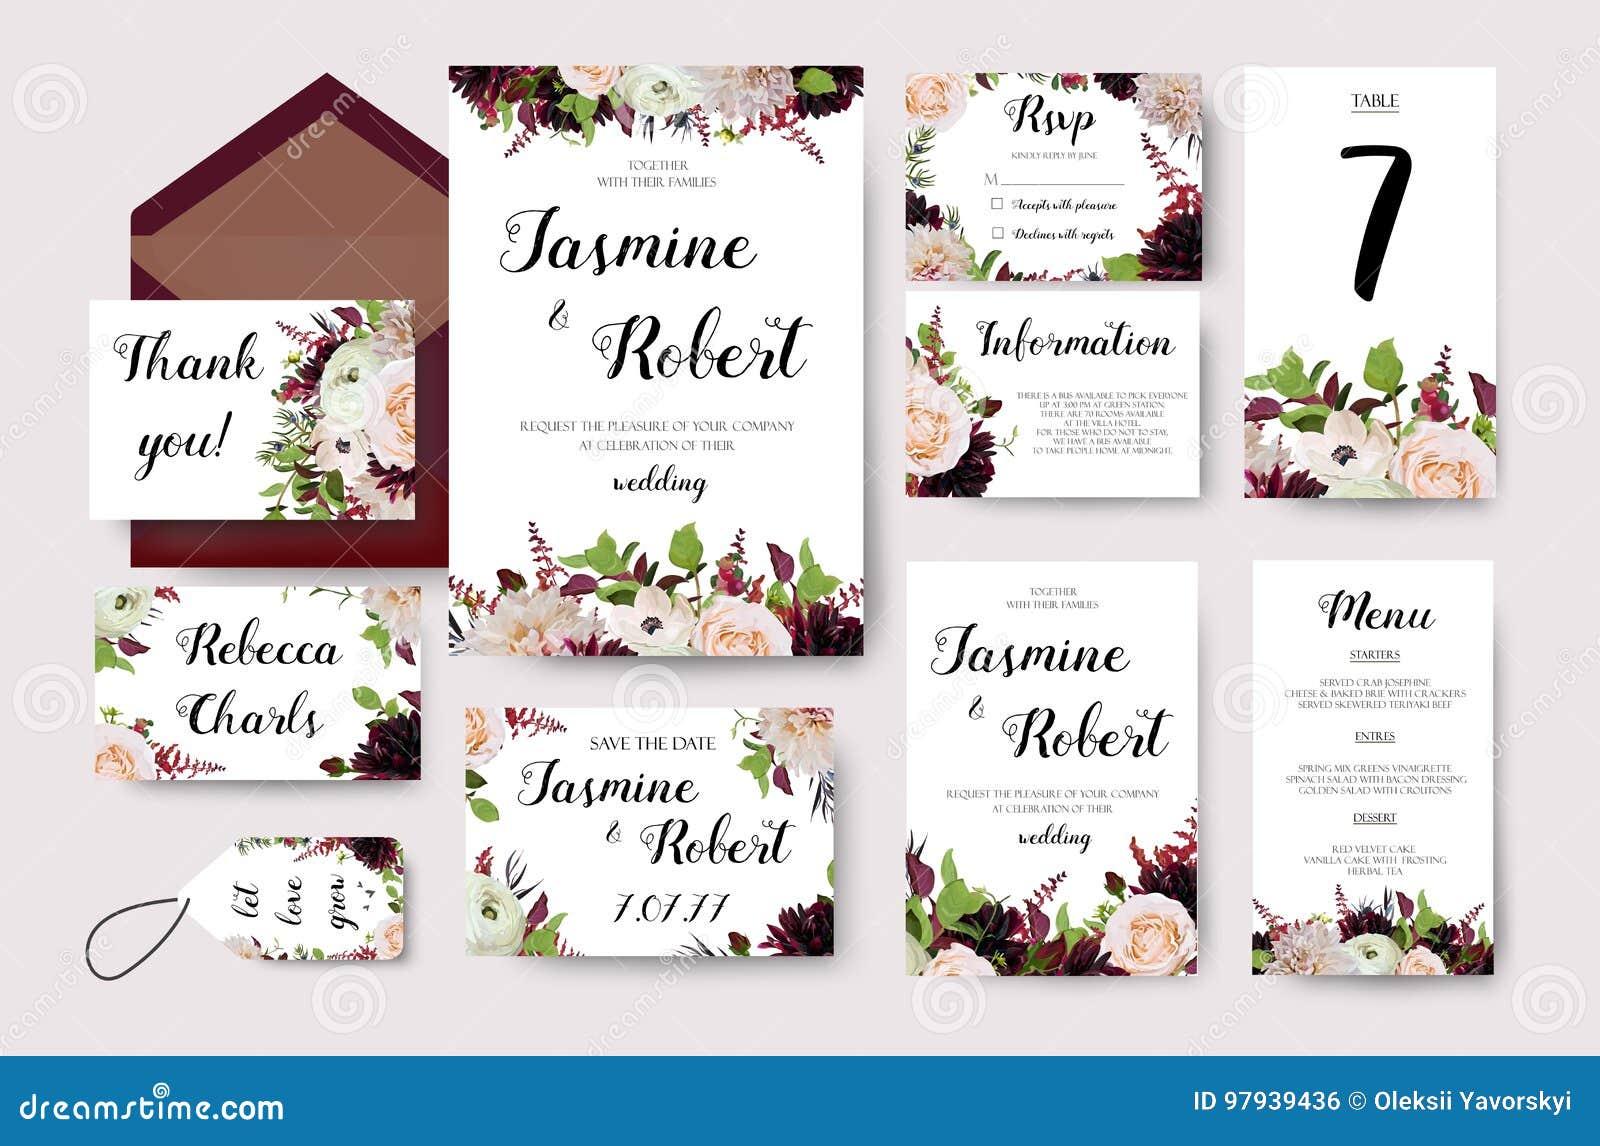 wedding invitation flower invite card design with garden peach stock